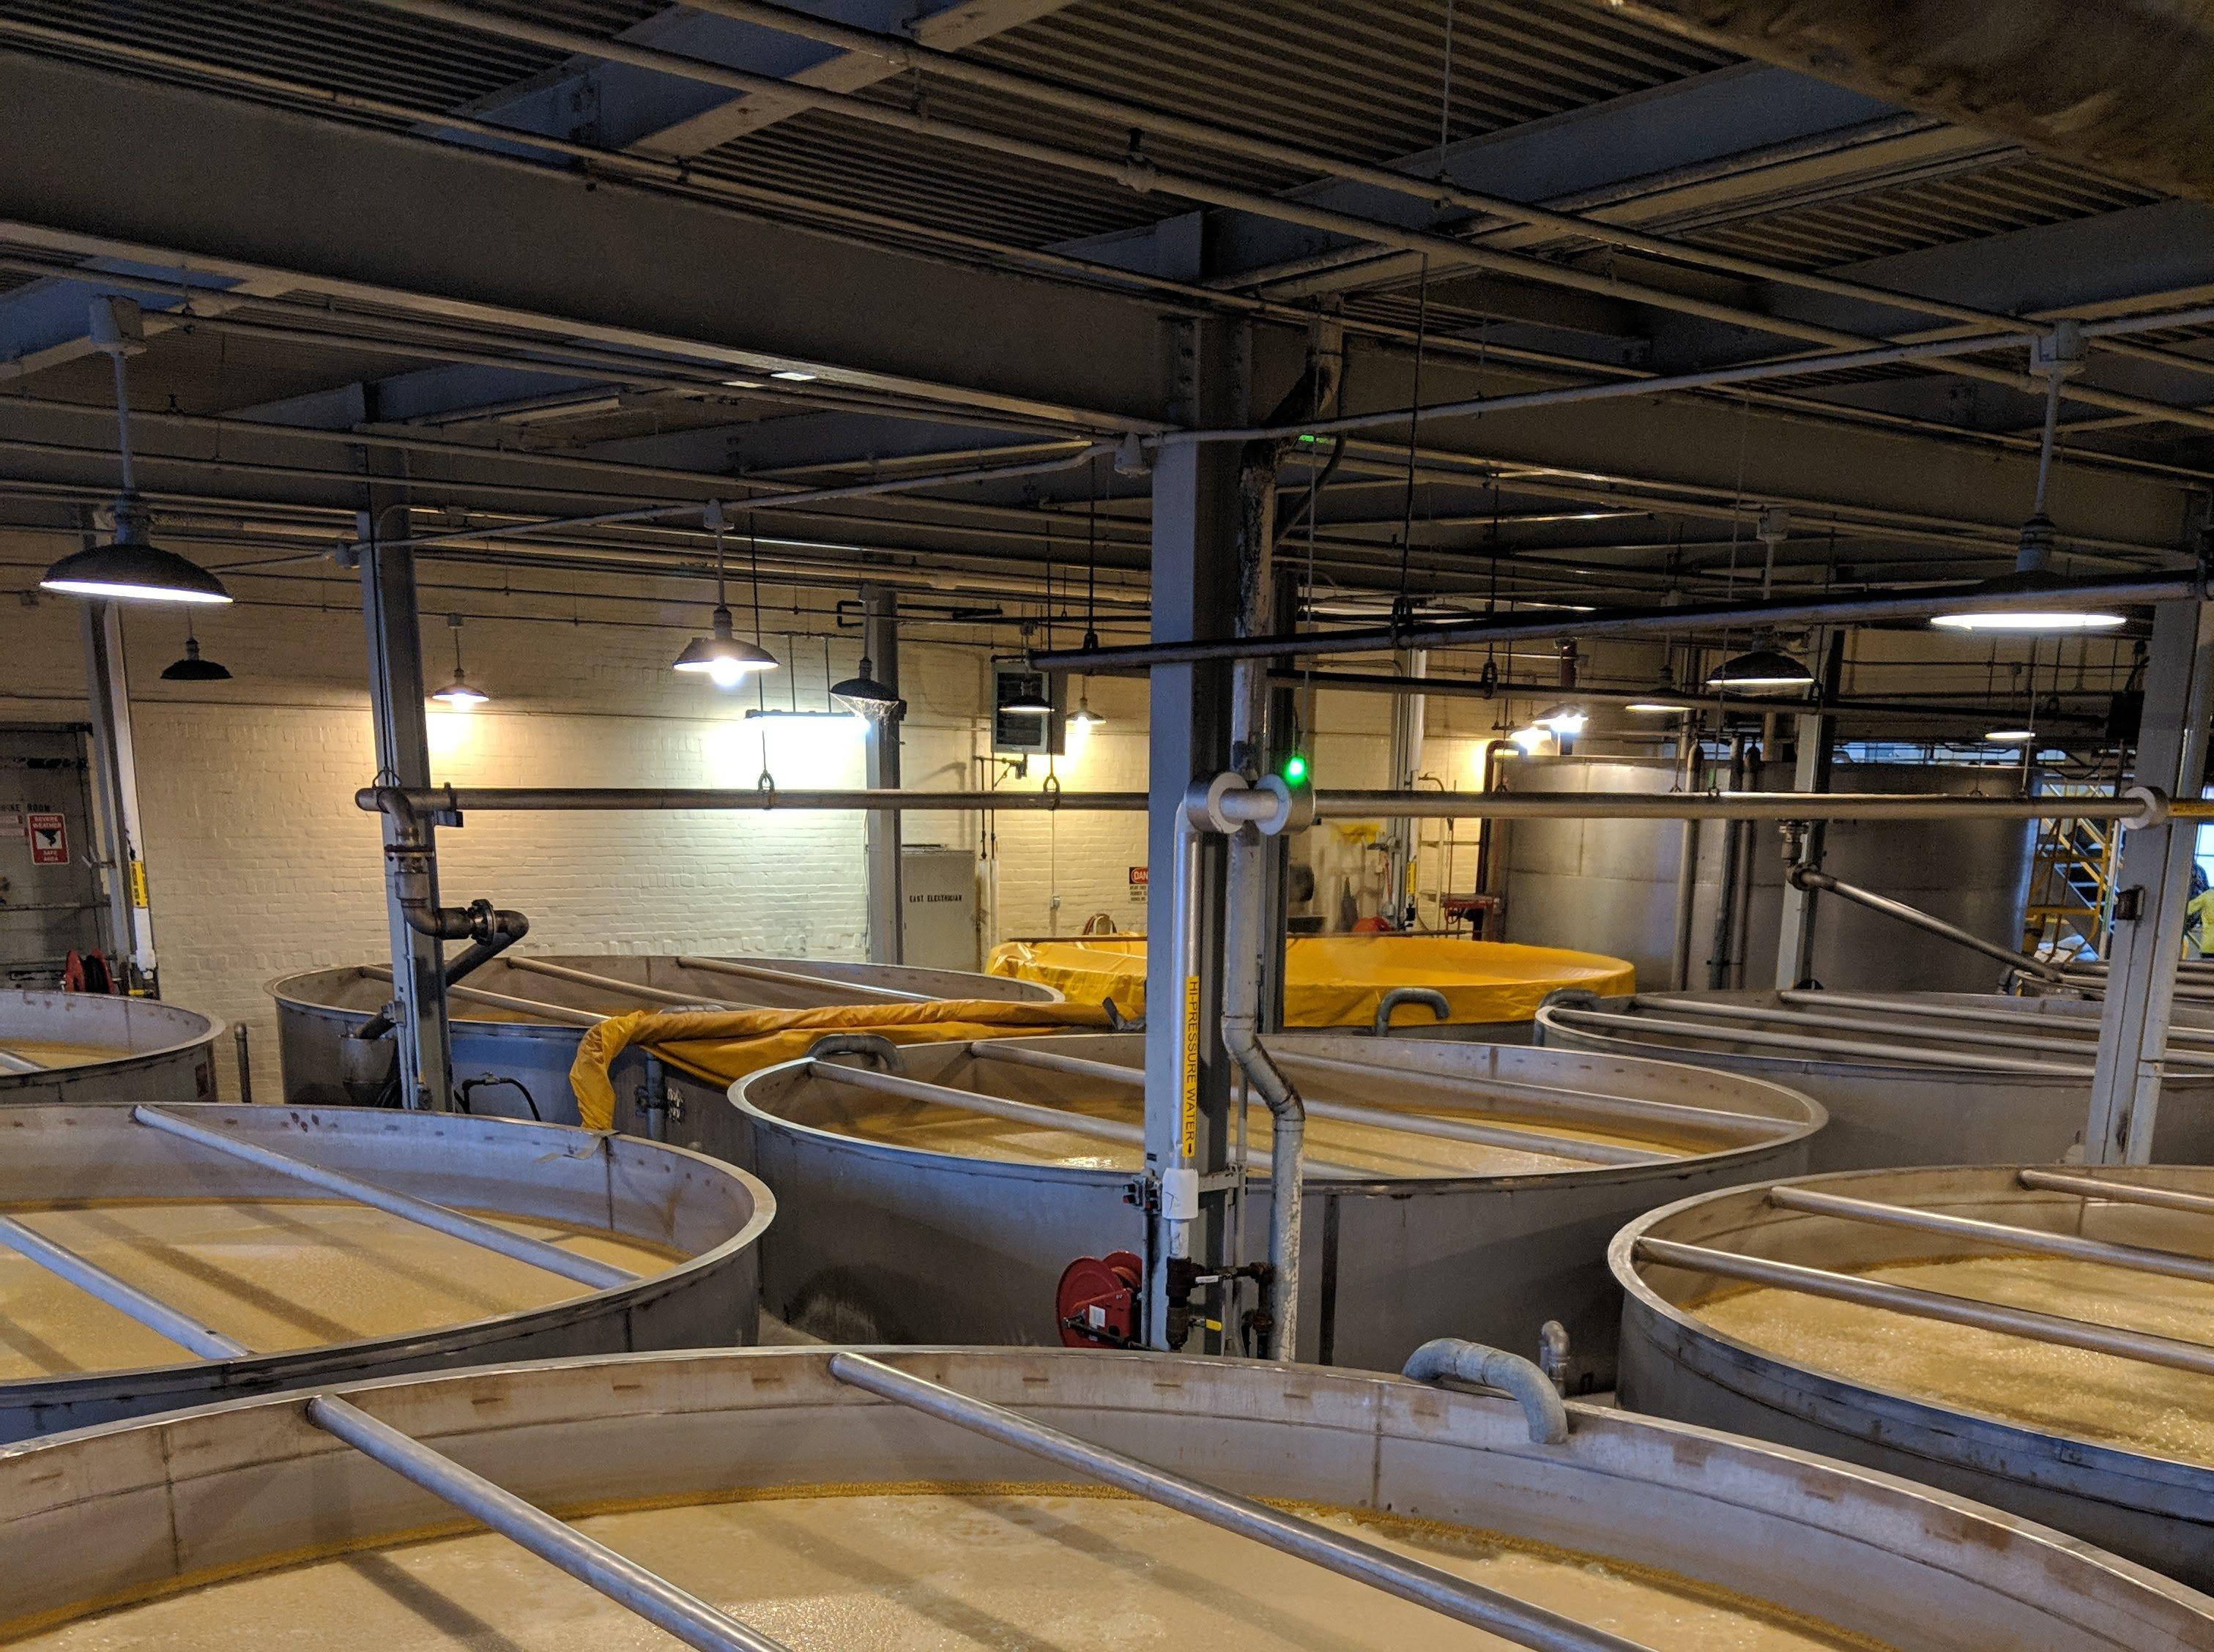 Mash barrels the MGP distillery in Lawrenceburg, Indiana, just outside Cincinnati.